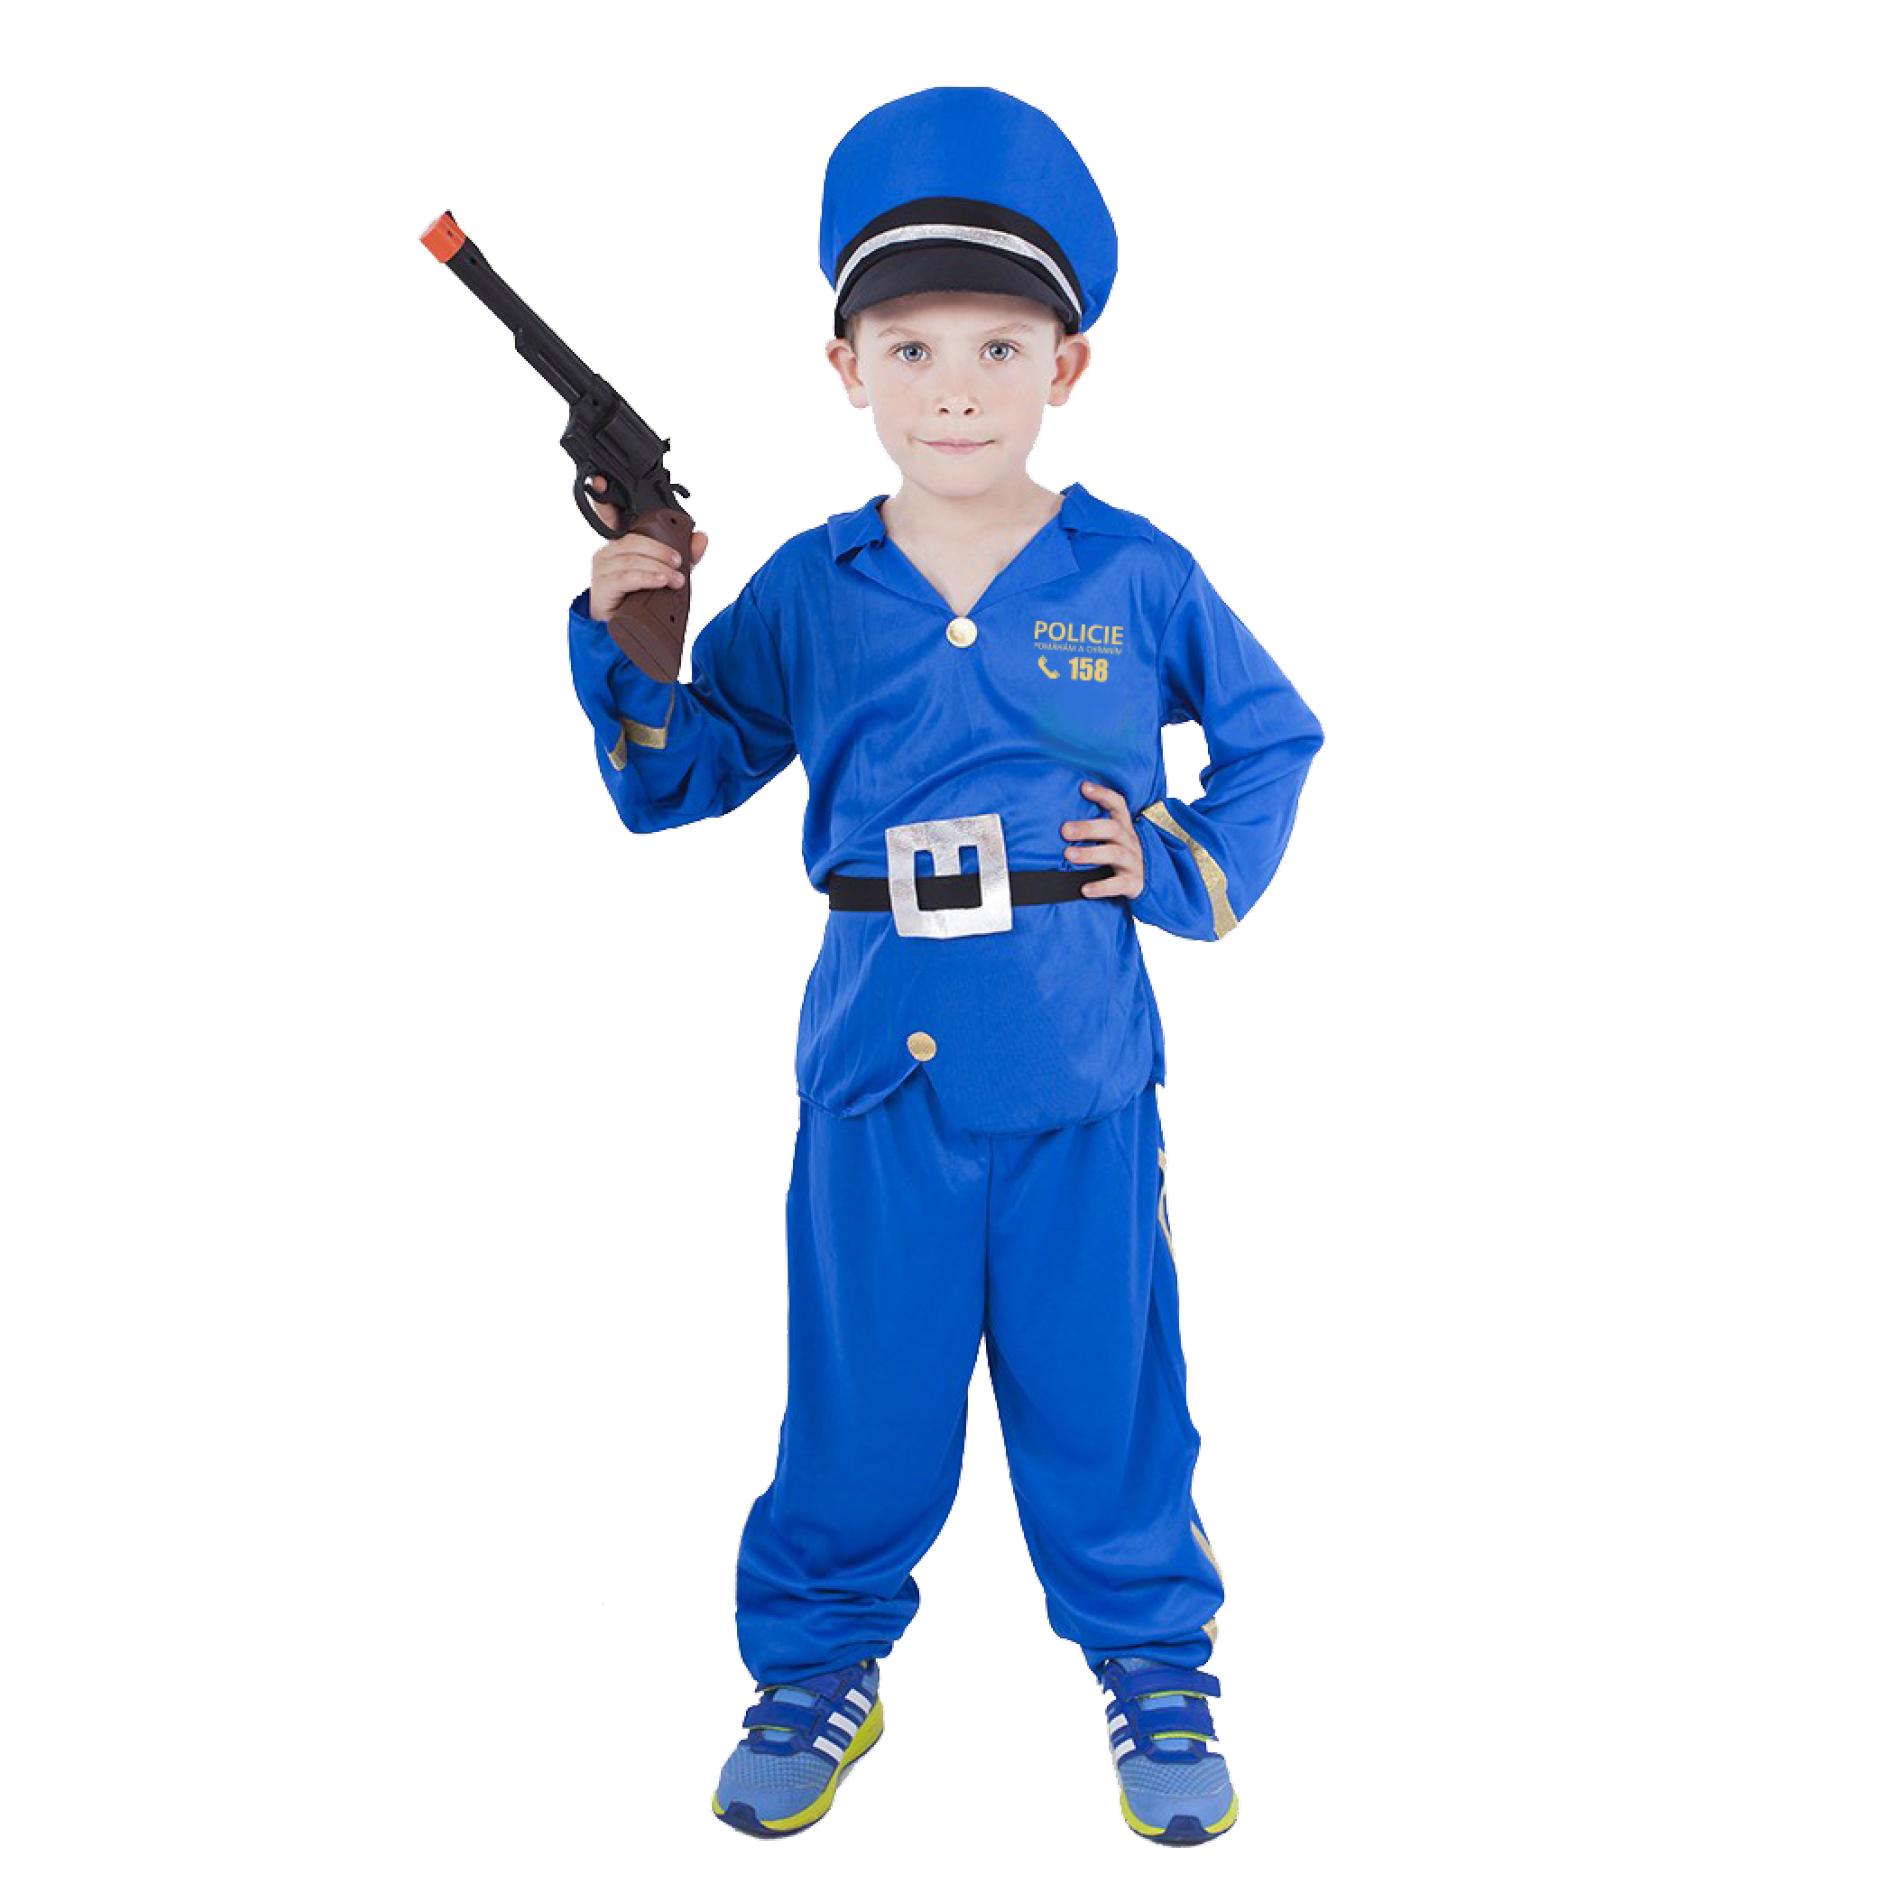 Dětský kostým policista (S) e-obal